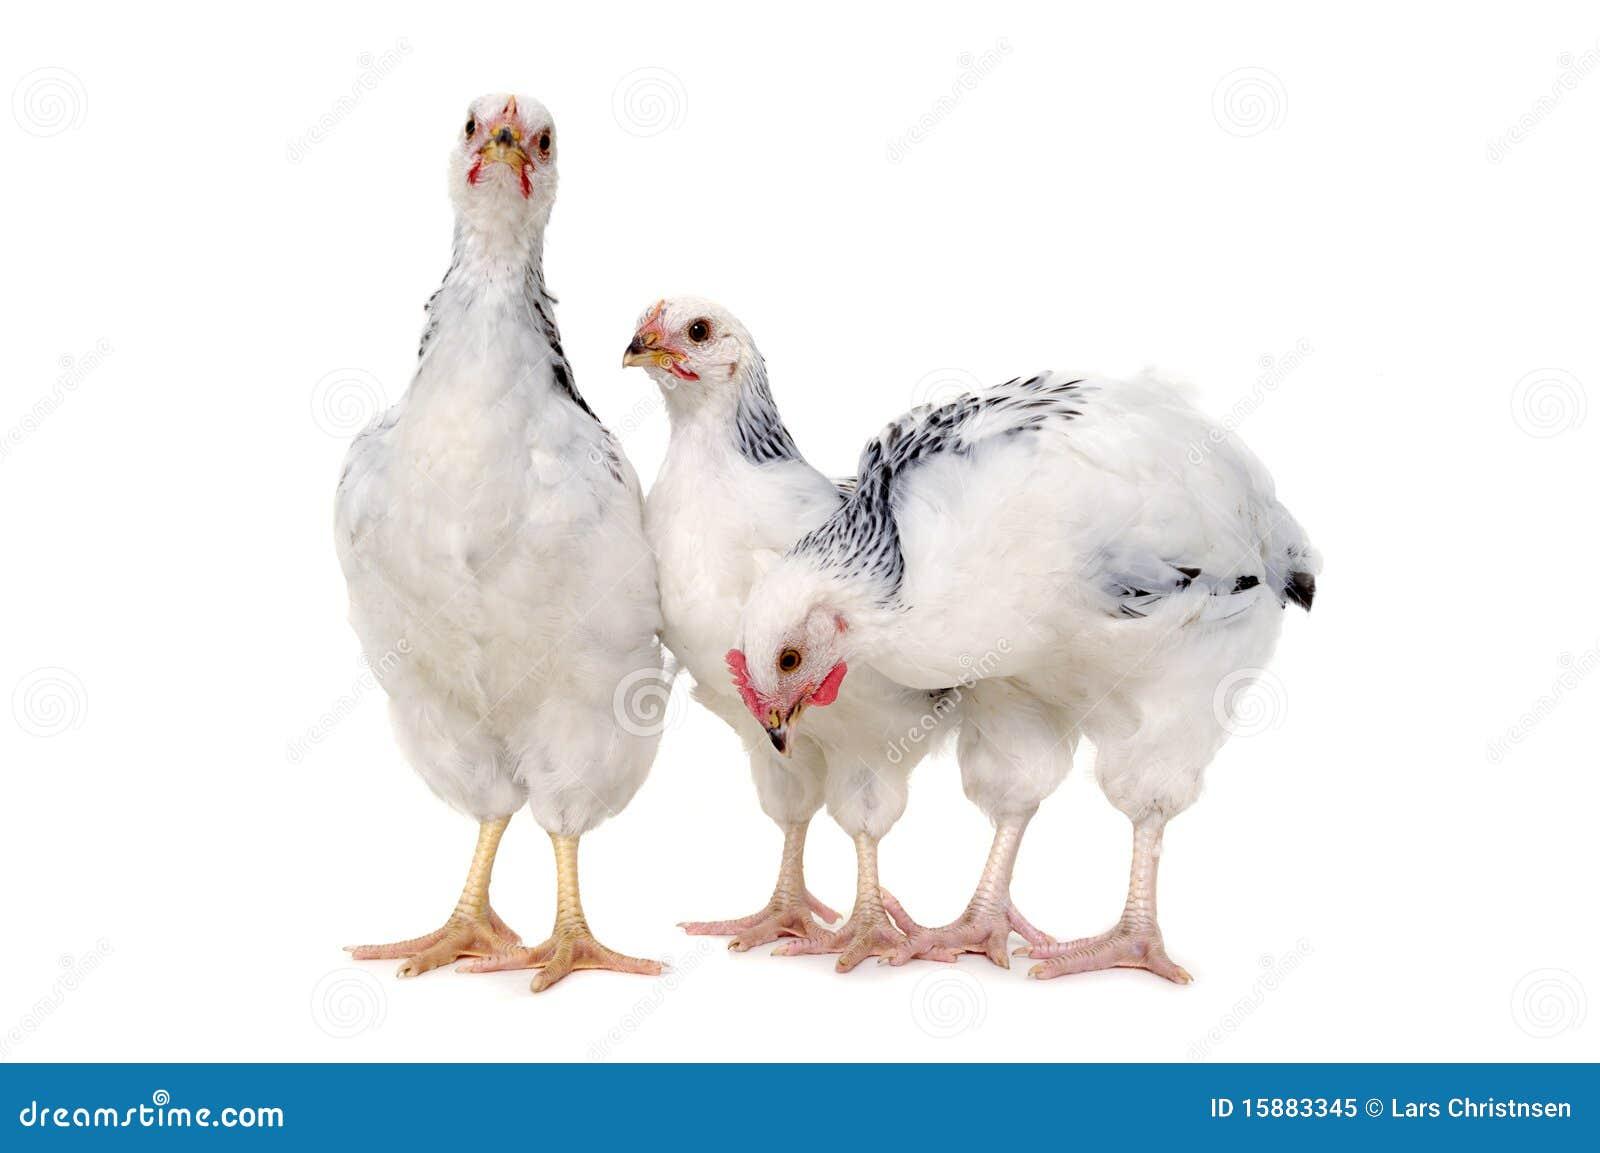 Standing chickens